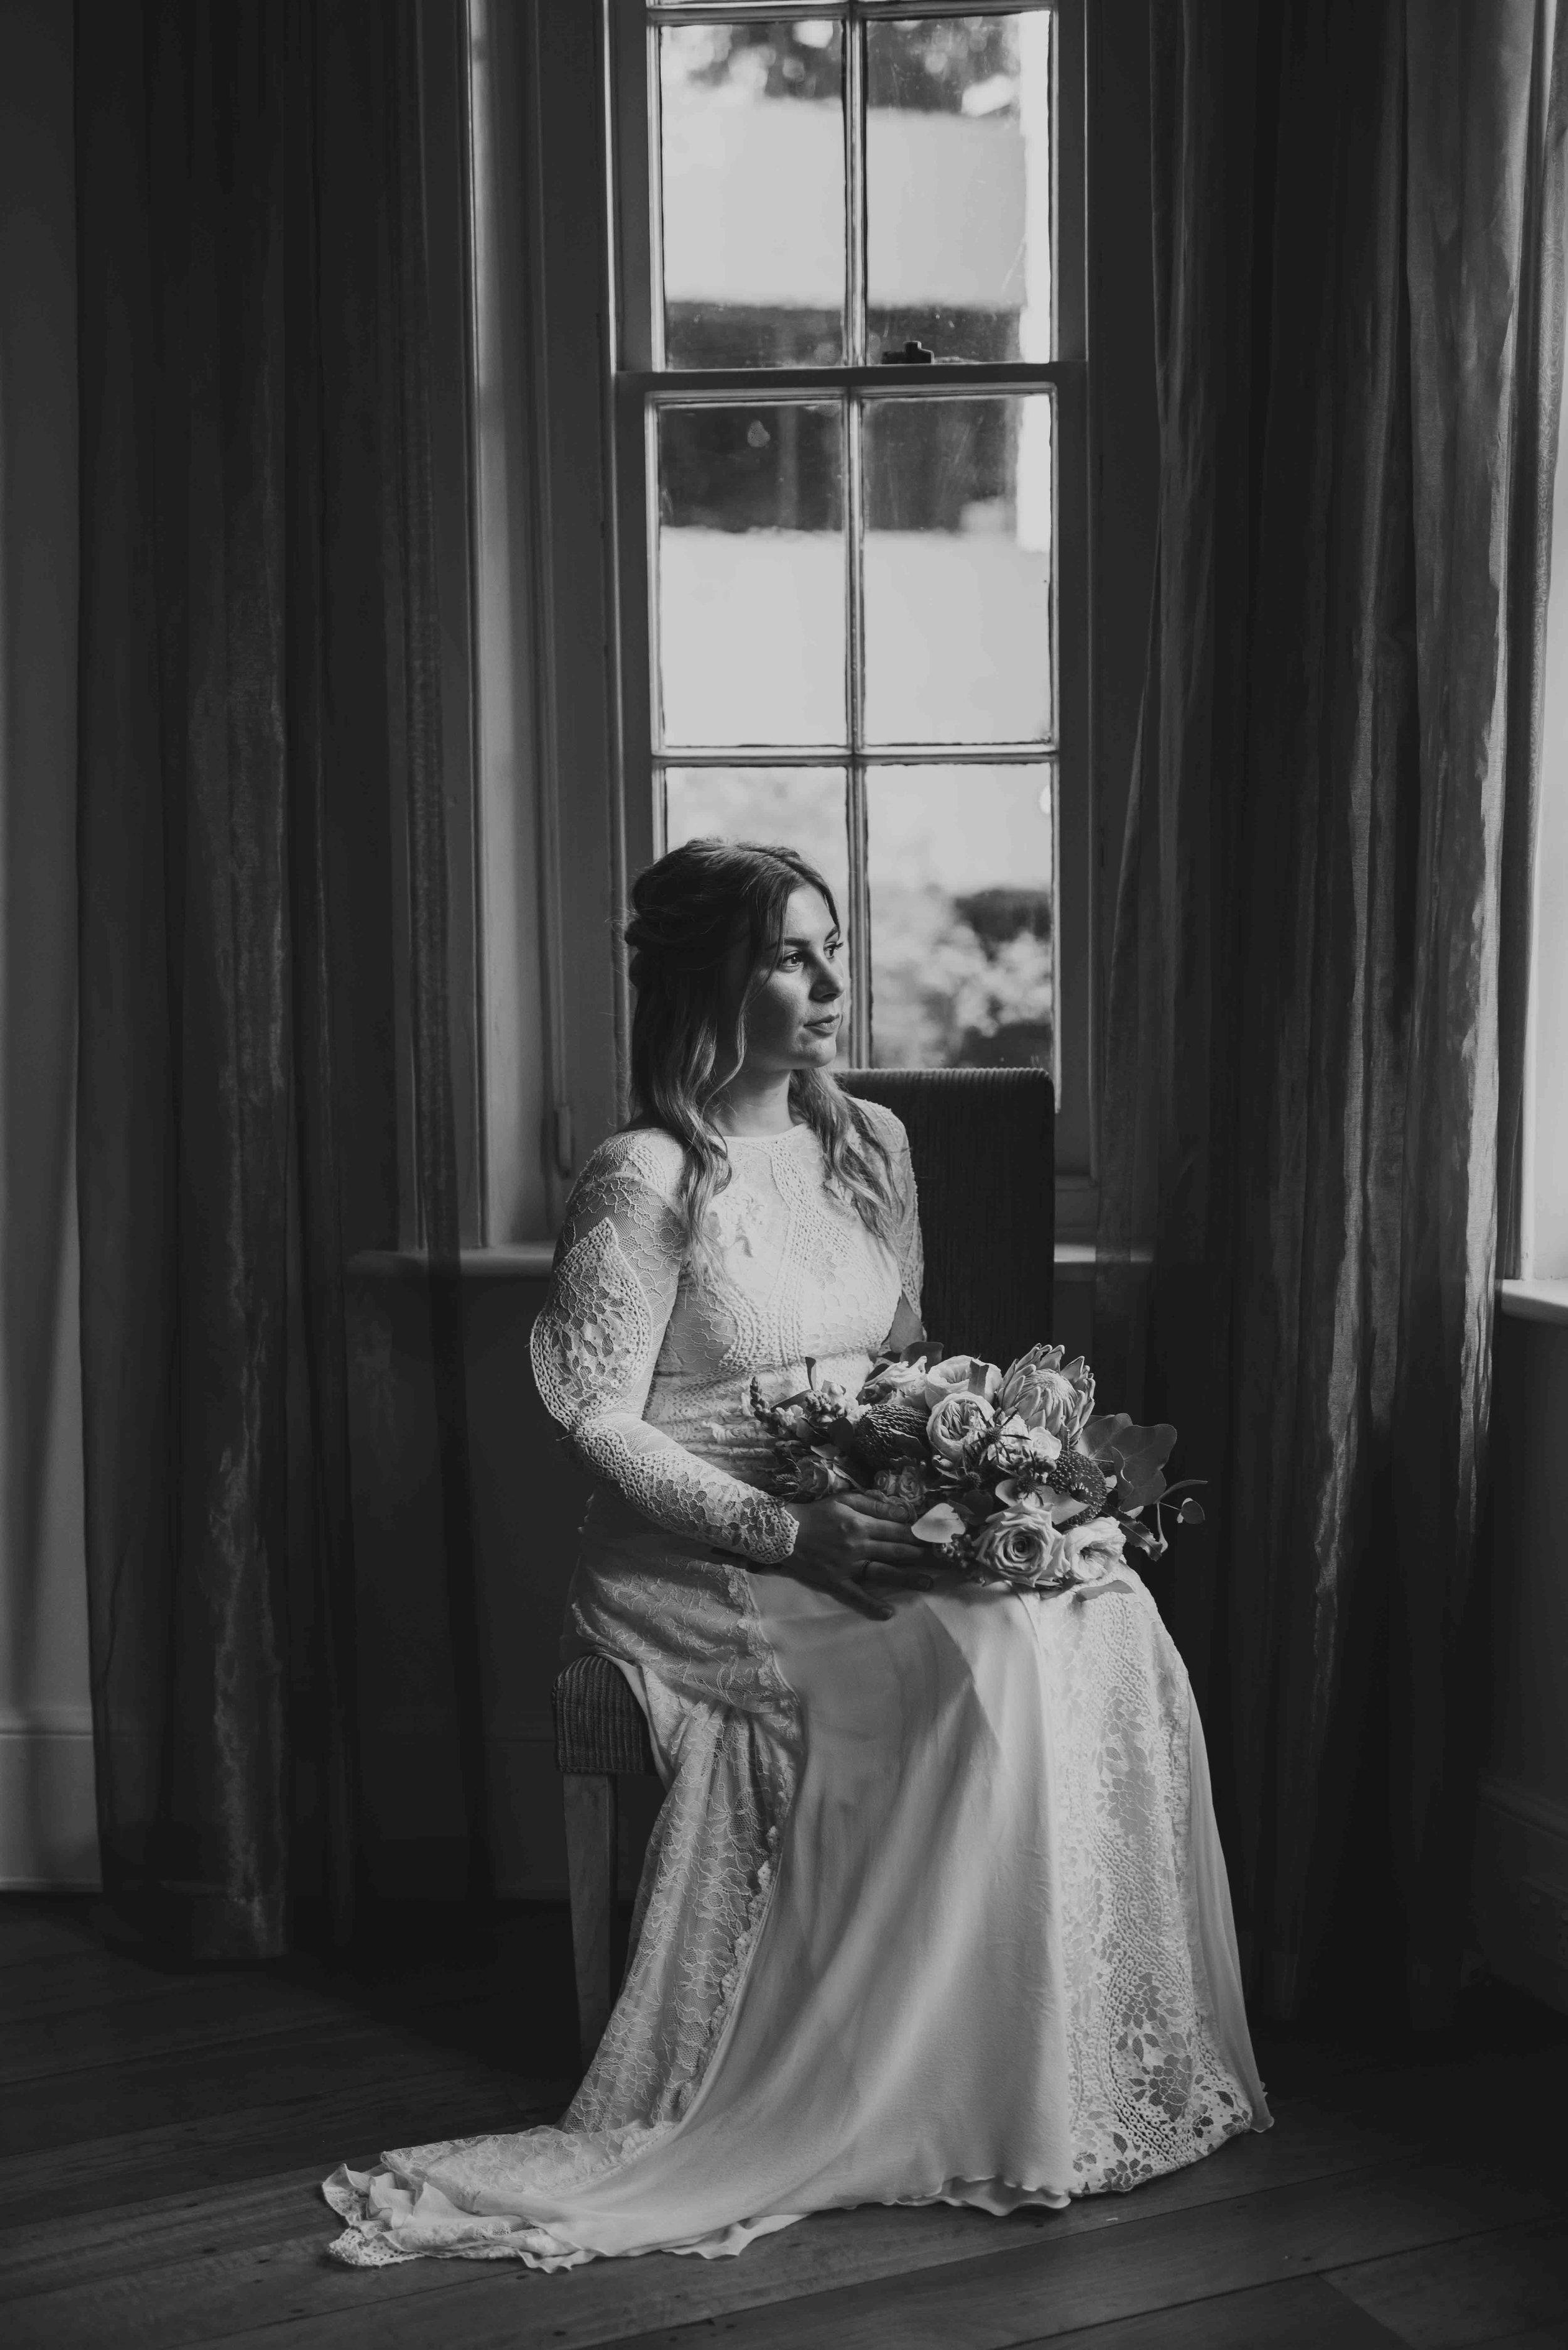 bishop house wedding photographer amy skinner photography-392 copy.jpg